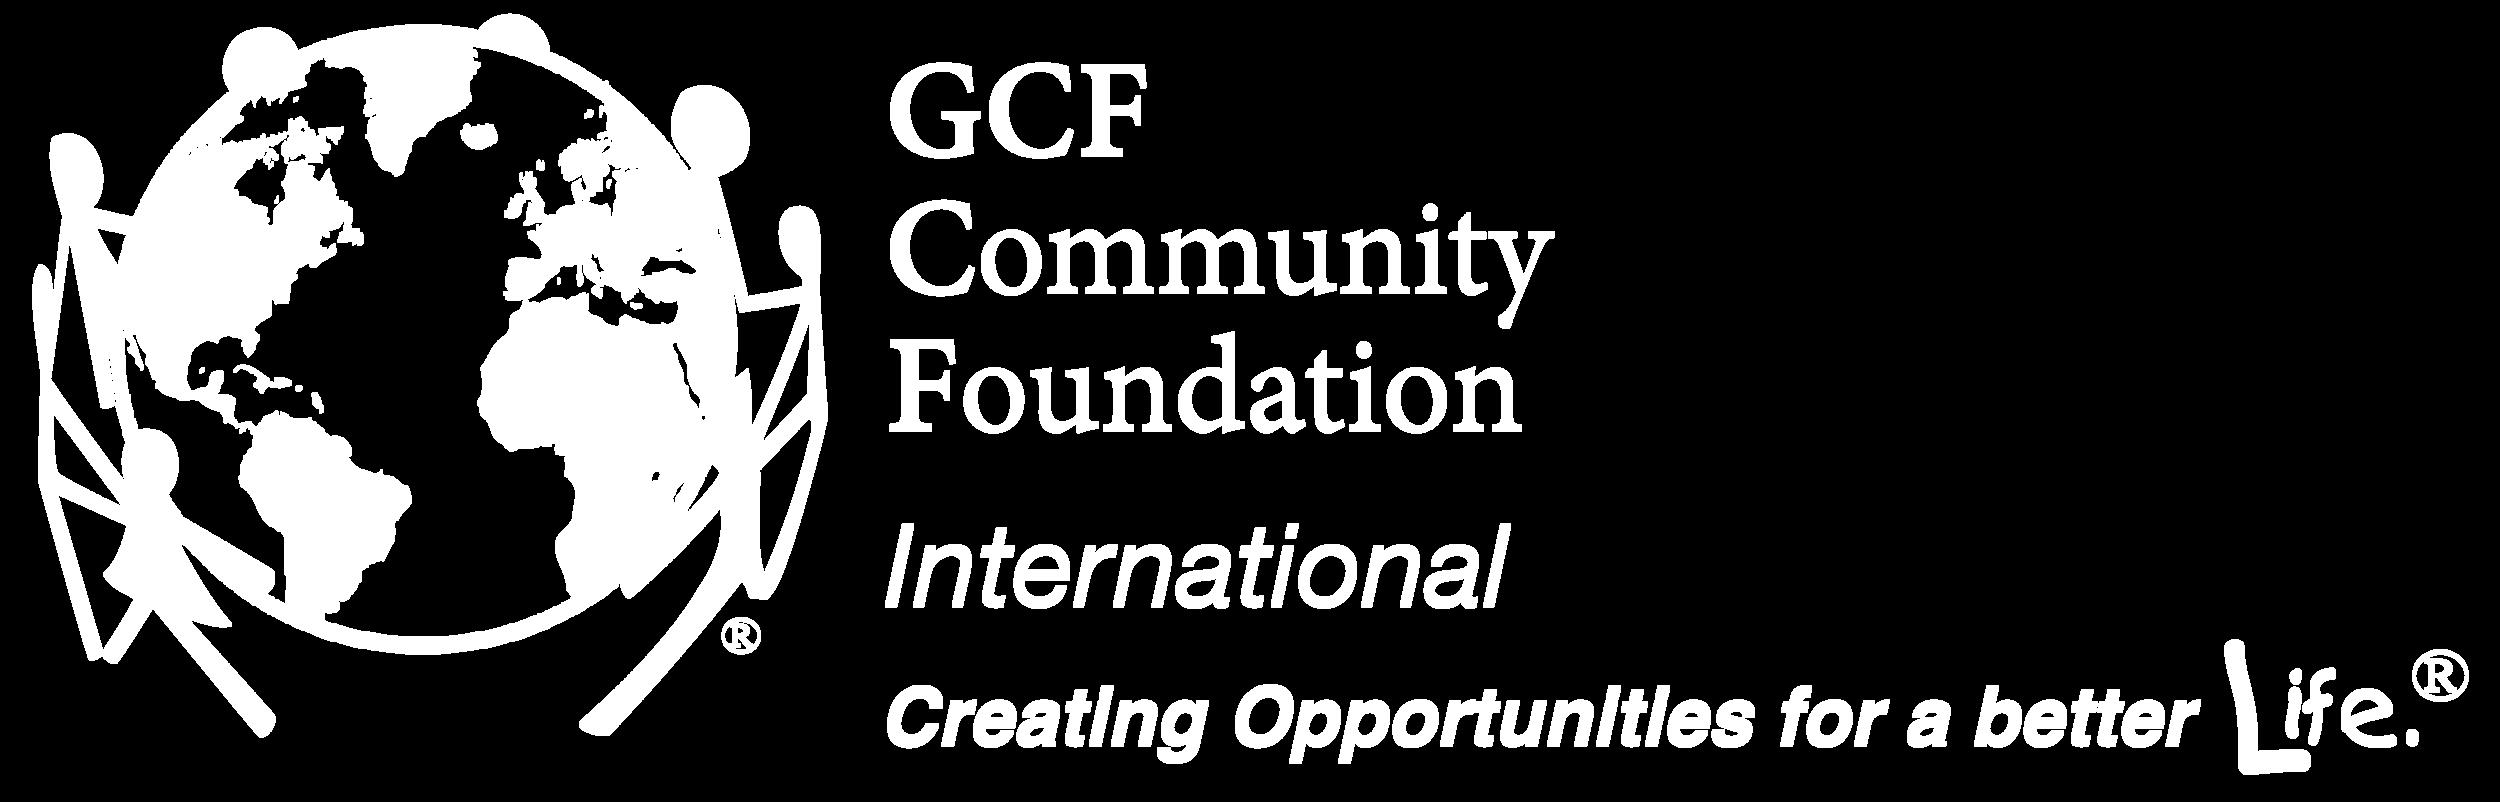 GCFInt_logo.png